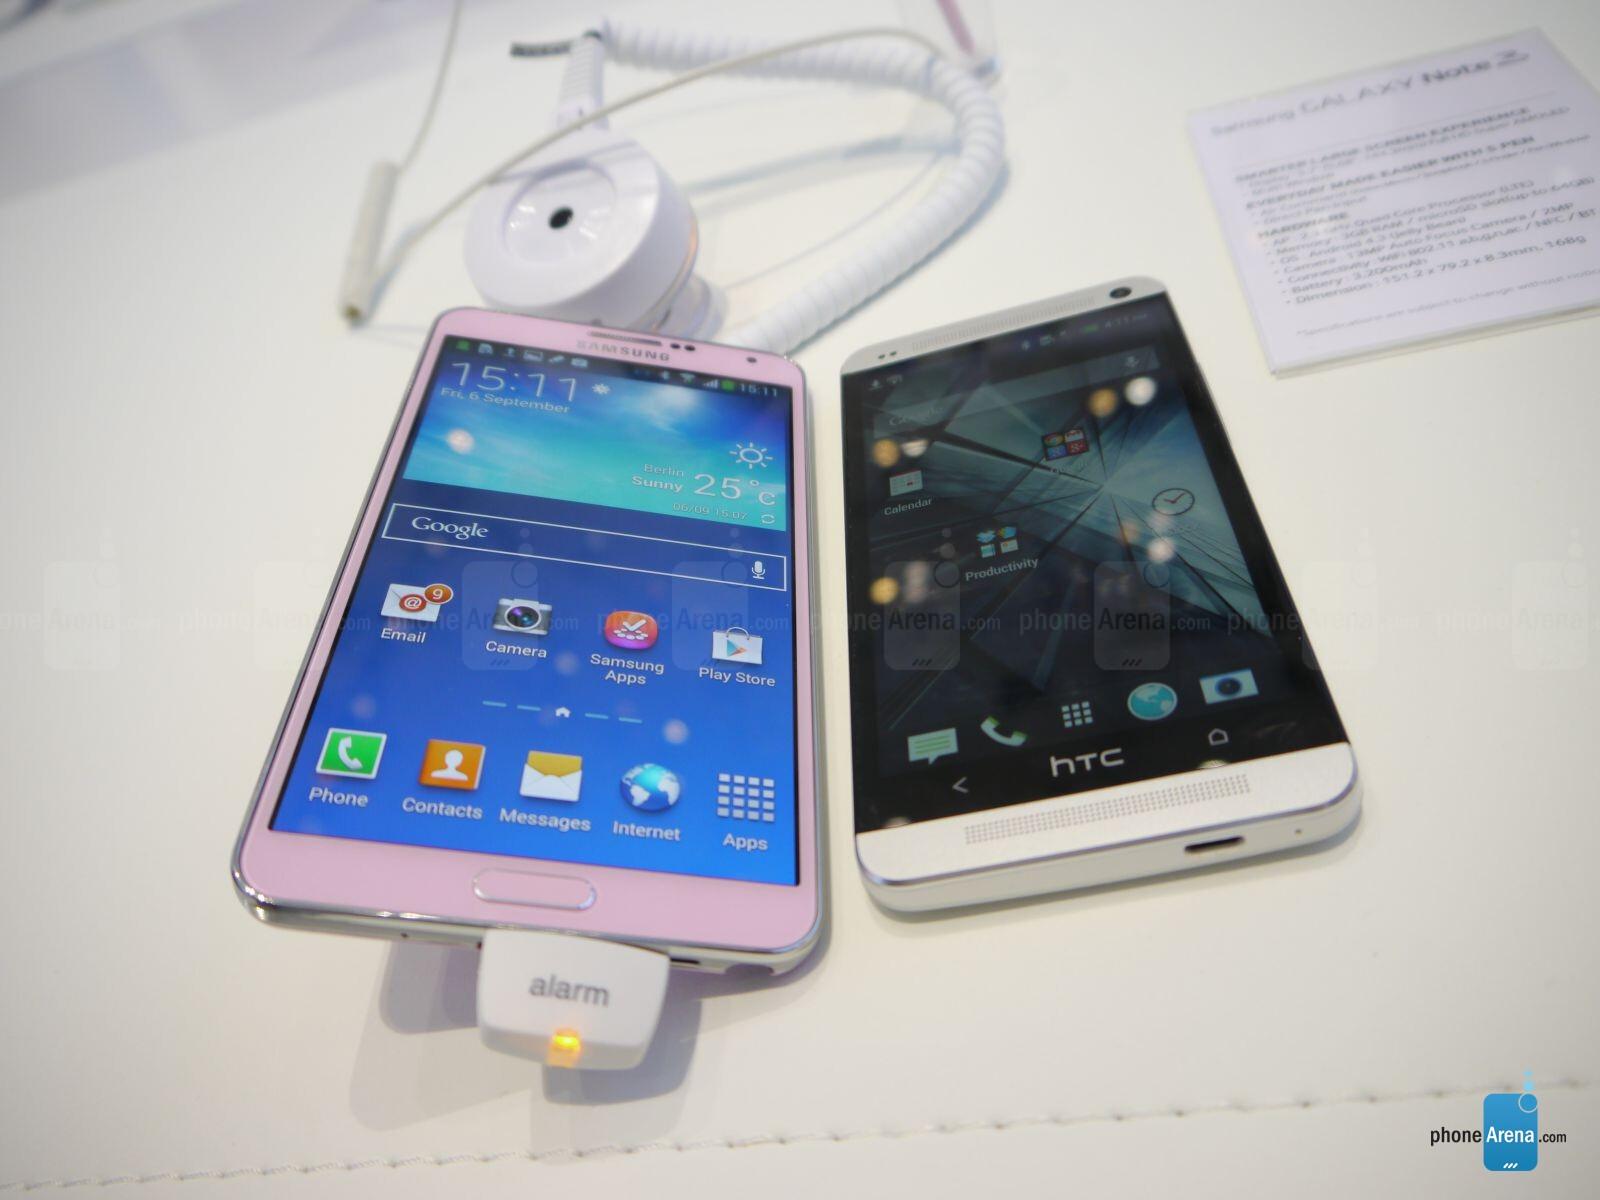 مقارنة شاملة بين Galaxy Note 3 و HTC One